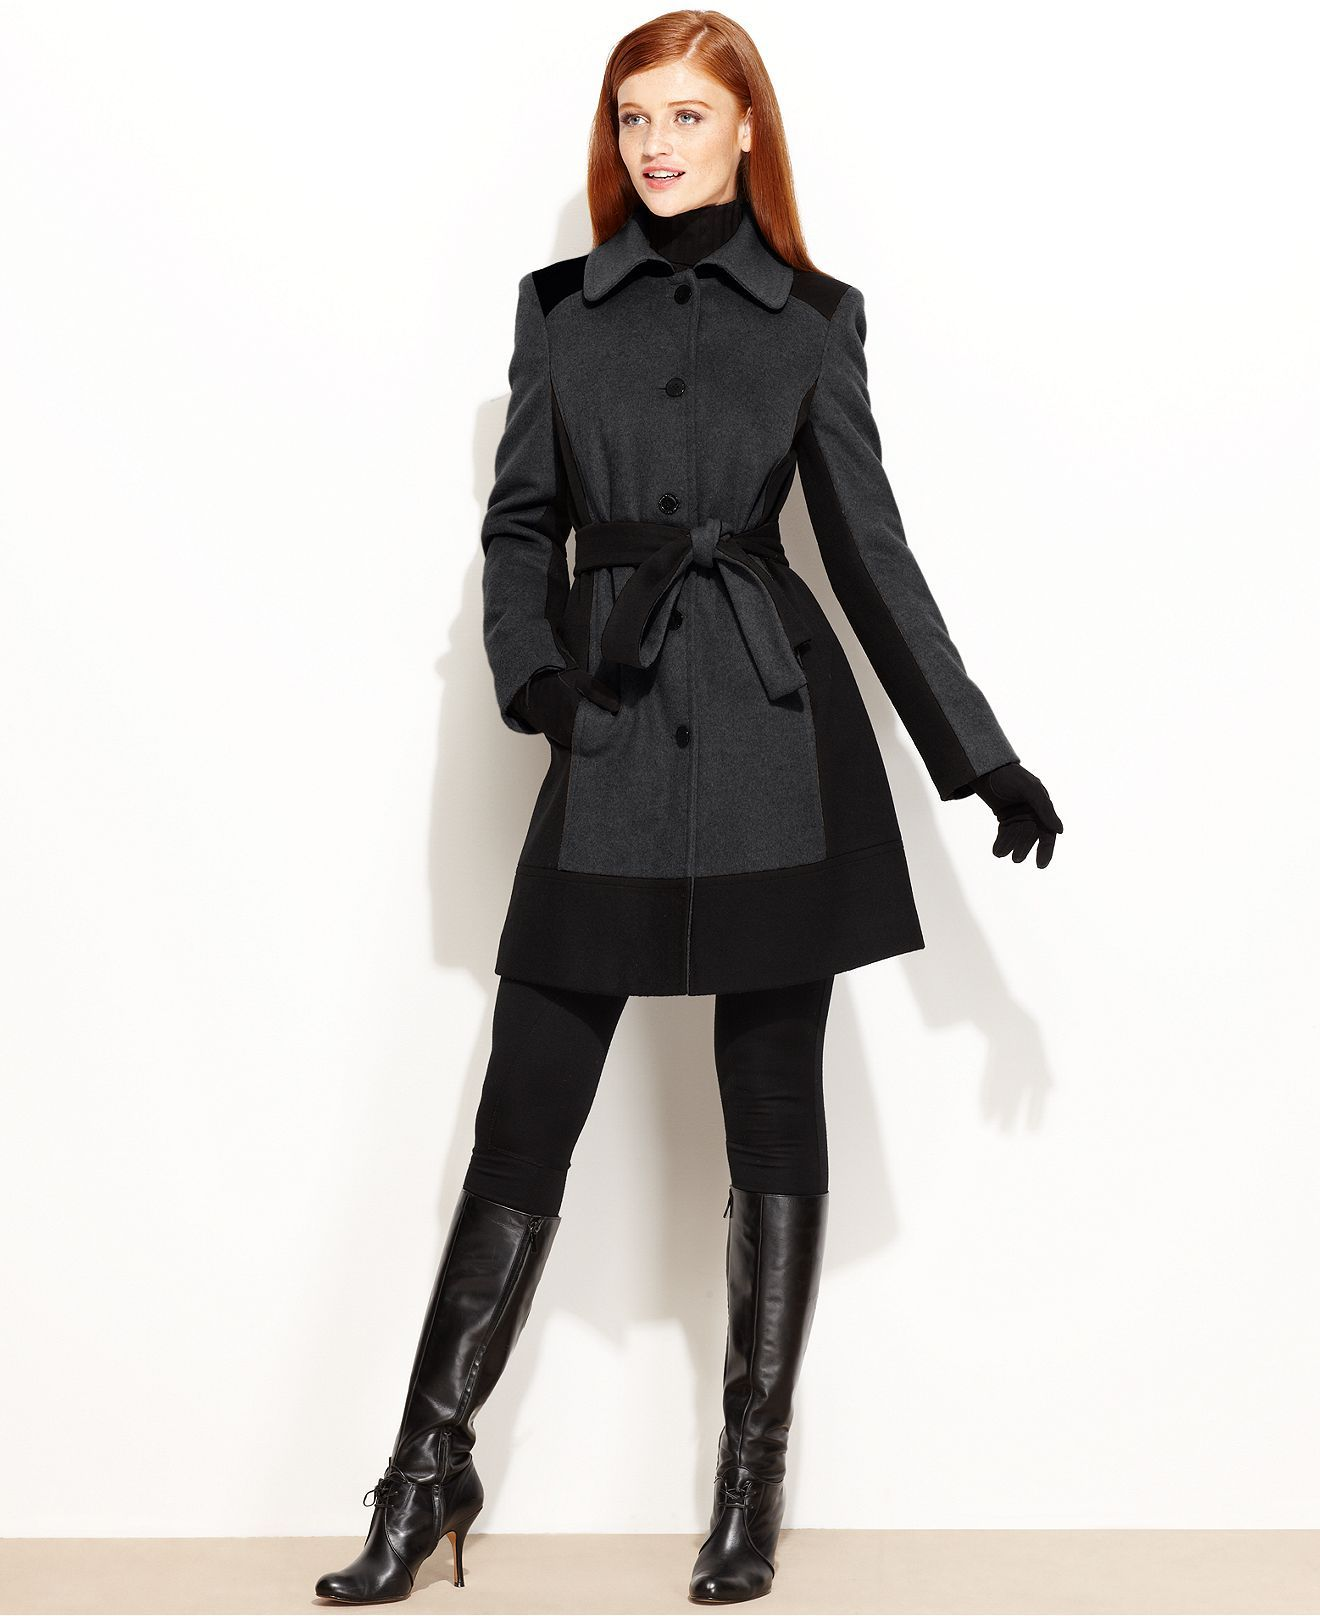 7240fc6bab0 Calvin Klein Coat, Colorblock Wool-Blend Belted $169.99 | Outerwear ...